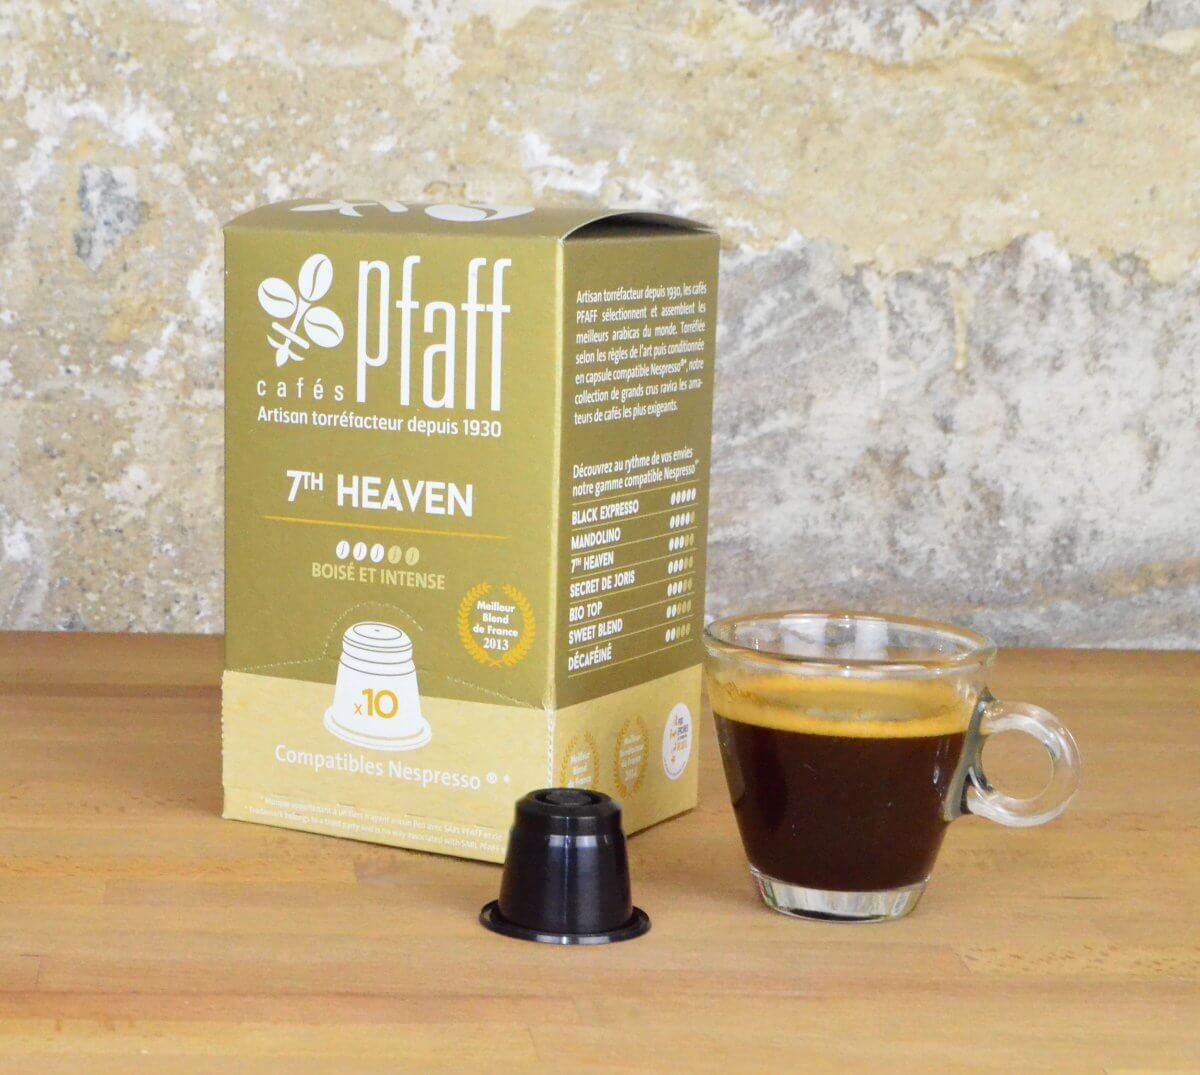 cafe 7th heaven 10 caspules compatibles nesperesso